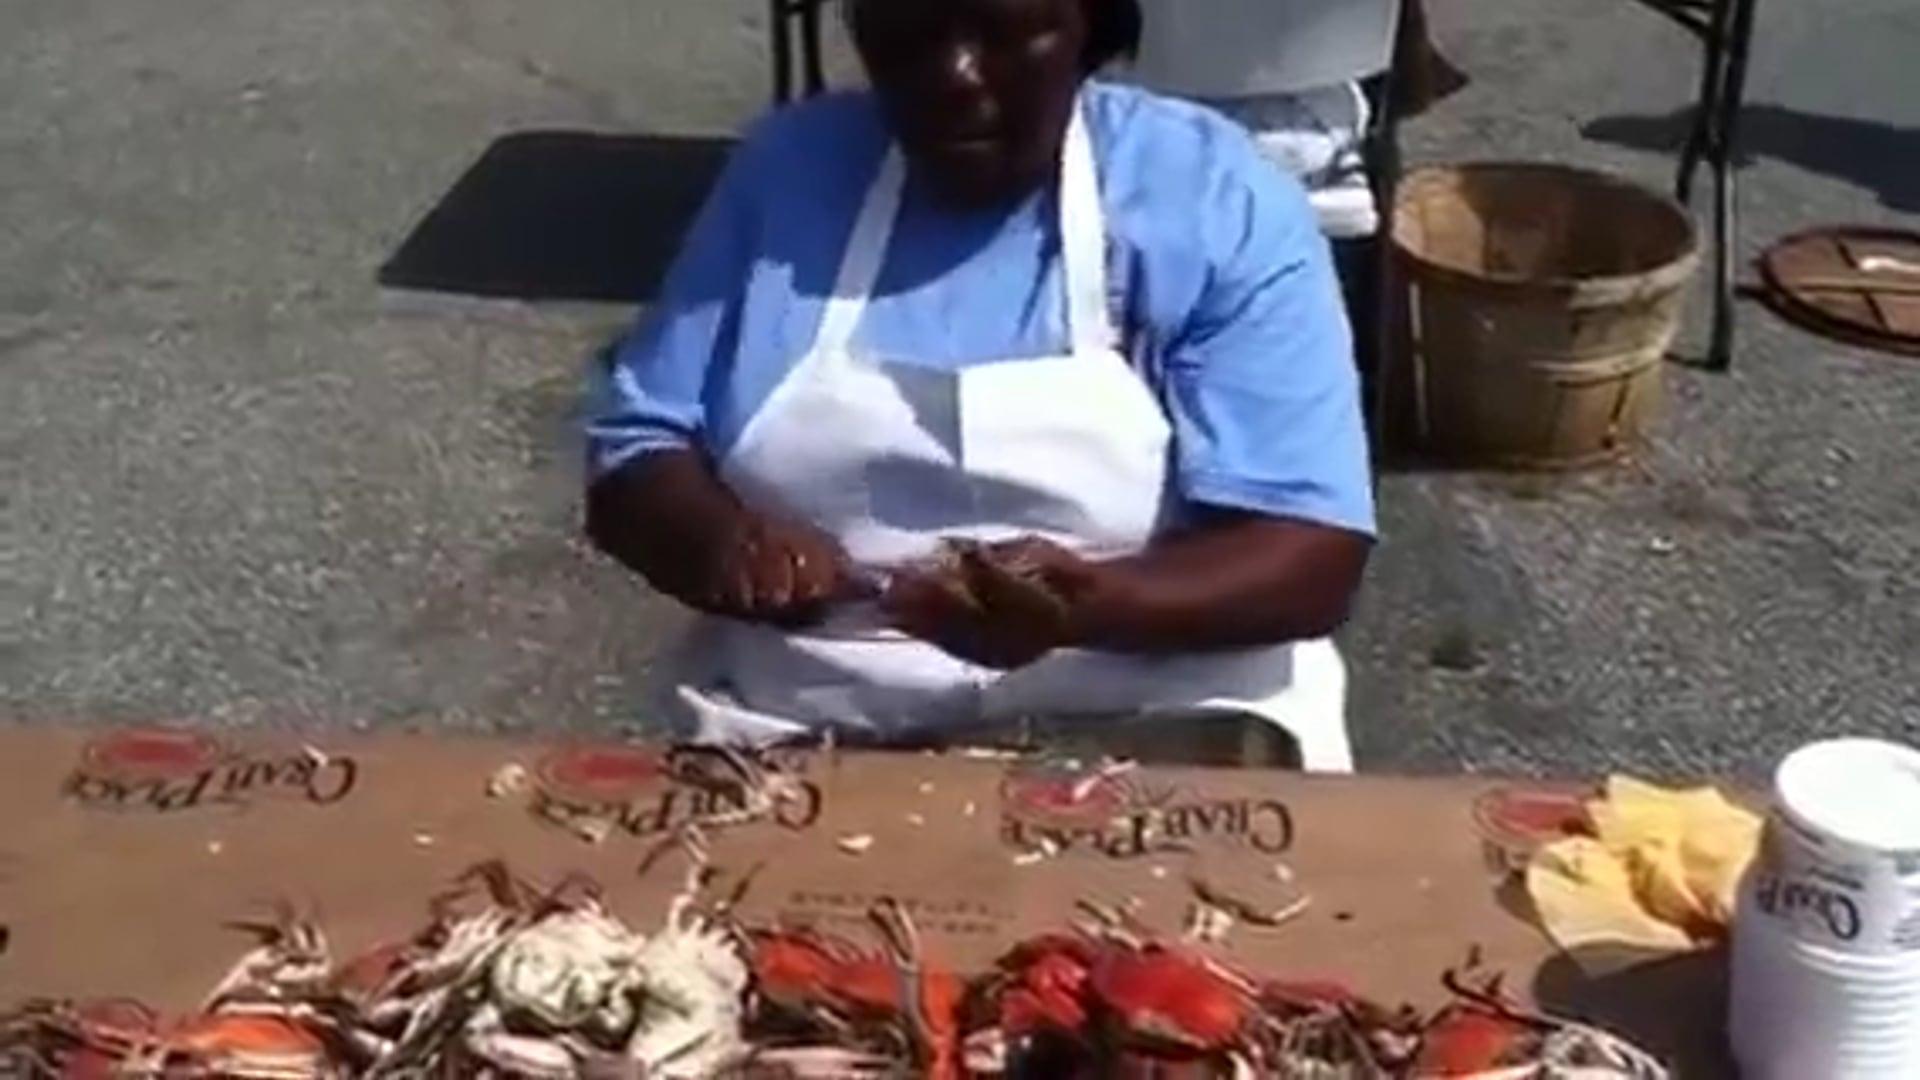 Hurricane Hazel at the National Hard Crab Derby Crab Pickin' Contest